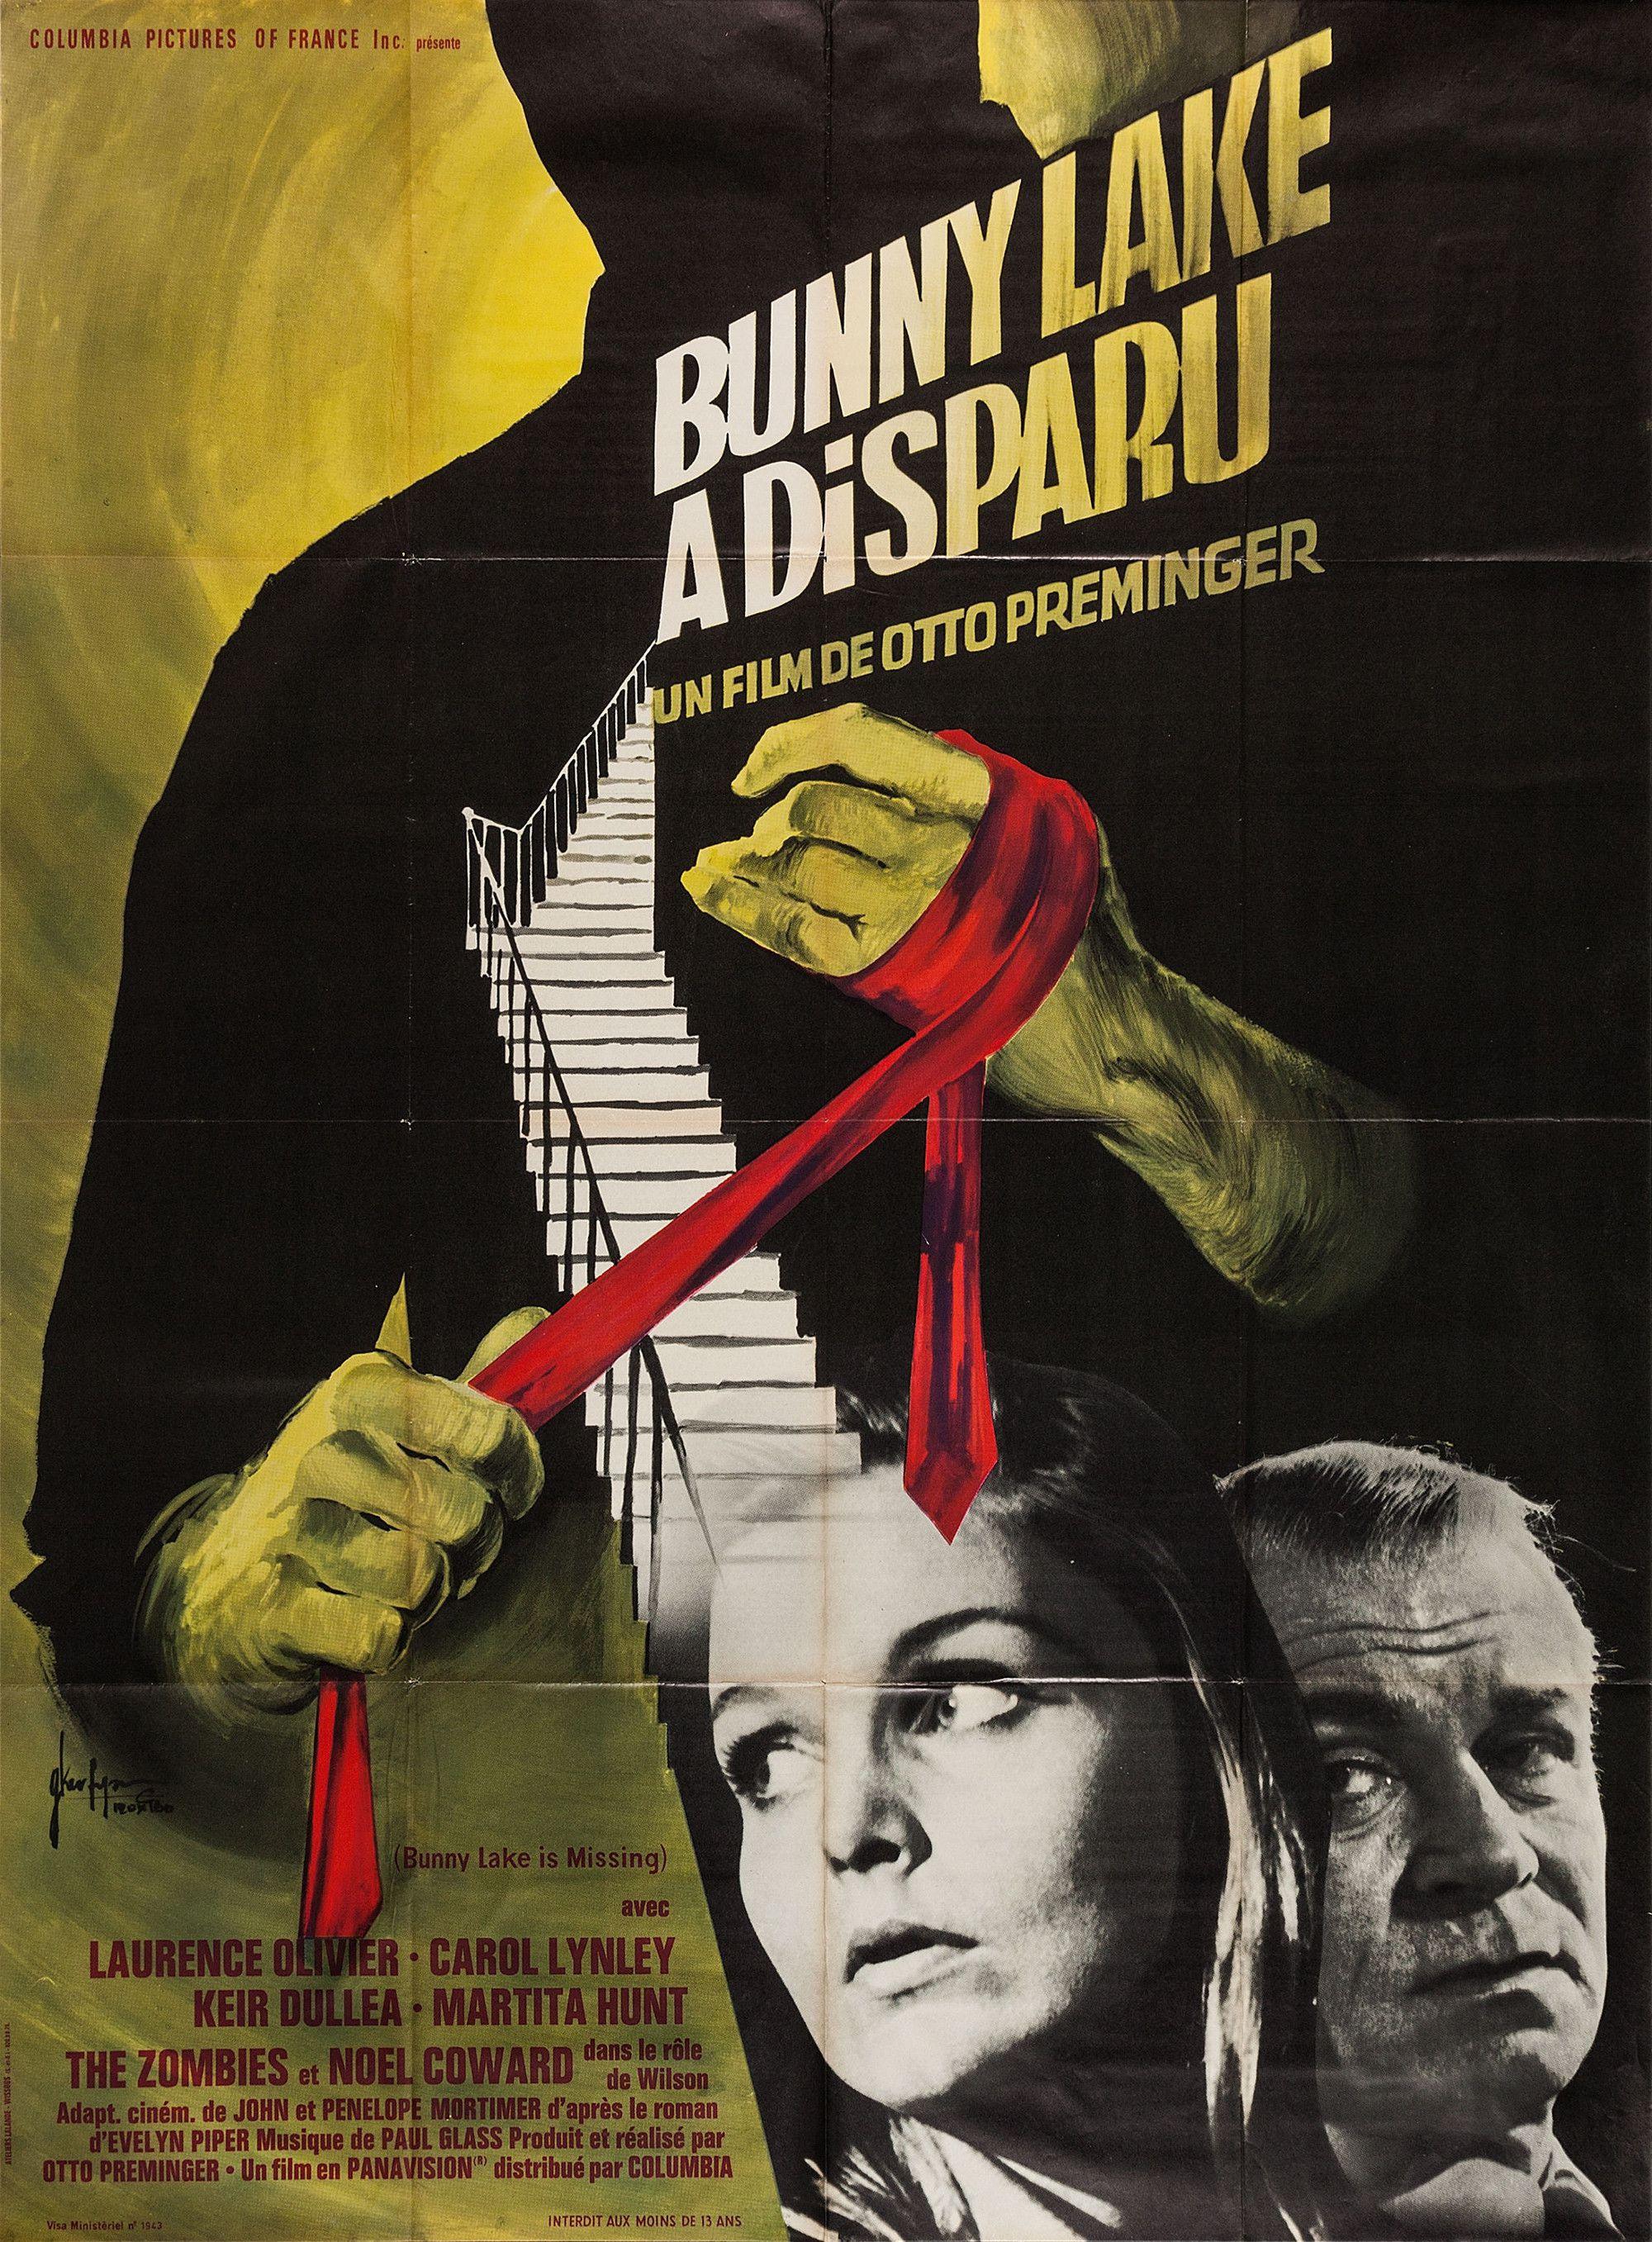 affiche Bunny Lake a disparu (1965) d'Otto Preminger